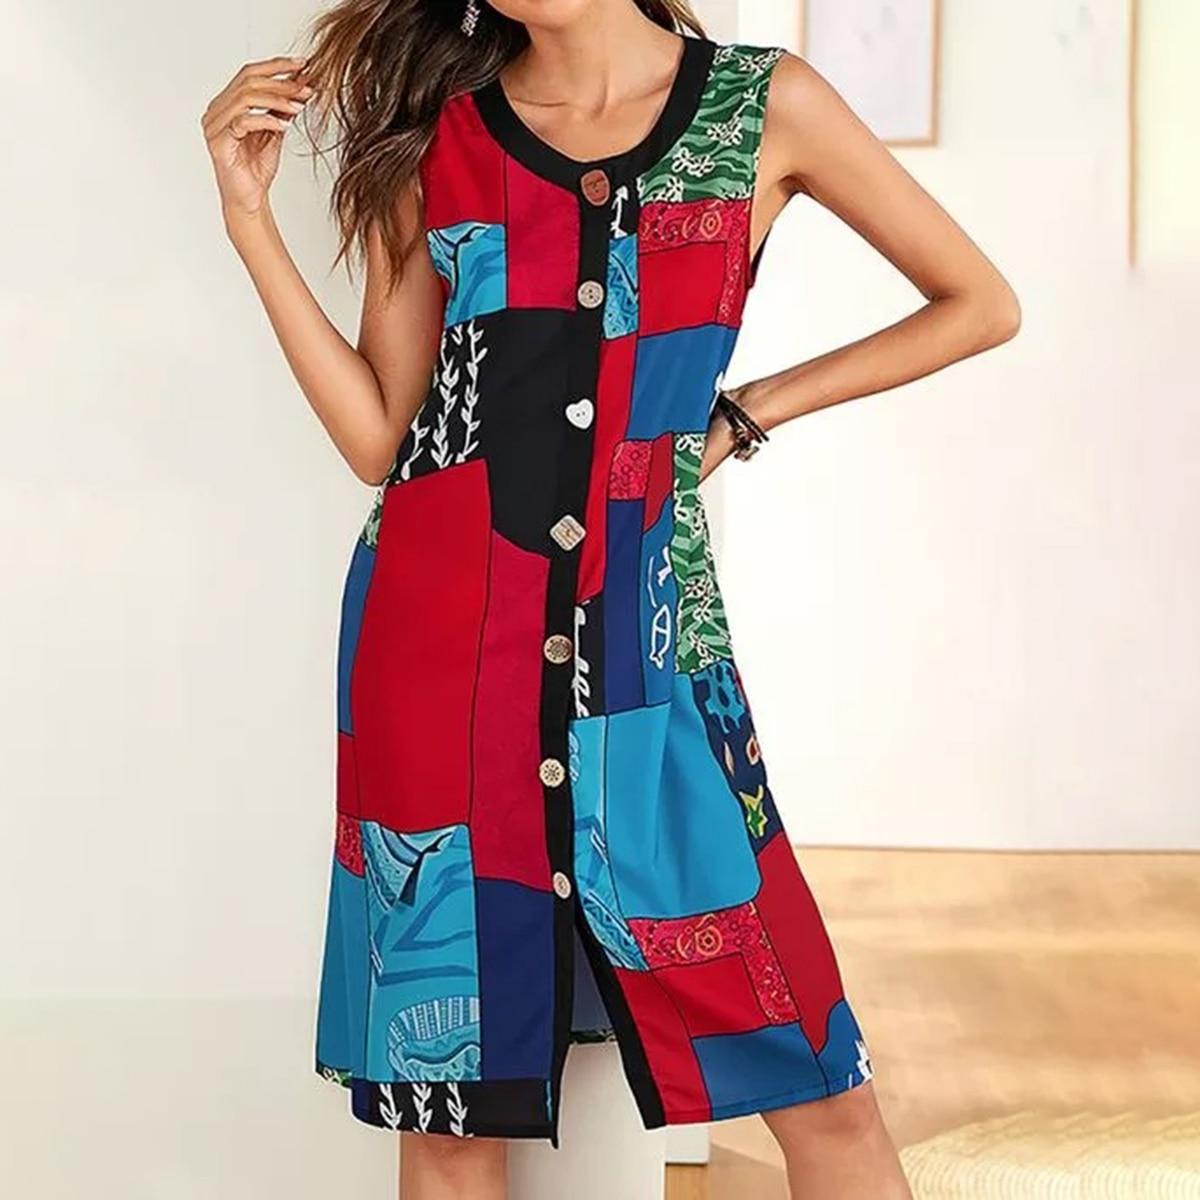 Geometry Print Mini Dress Women O Collar Sleeveles Above Knee Dress Summer Autumn 2020 Casual Chic Simple Vestidos Female